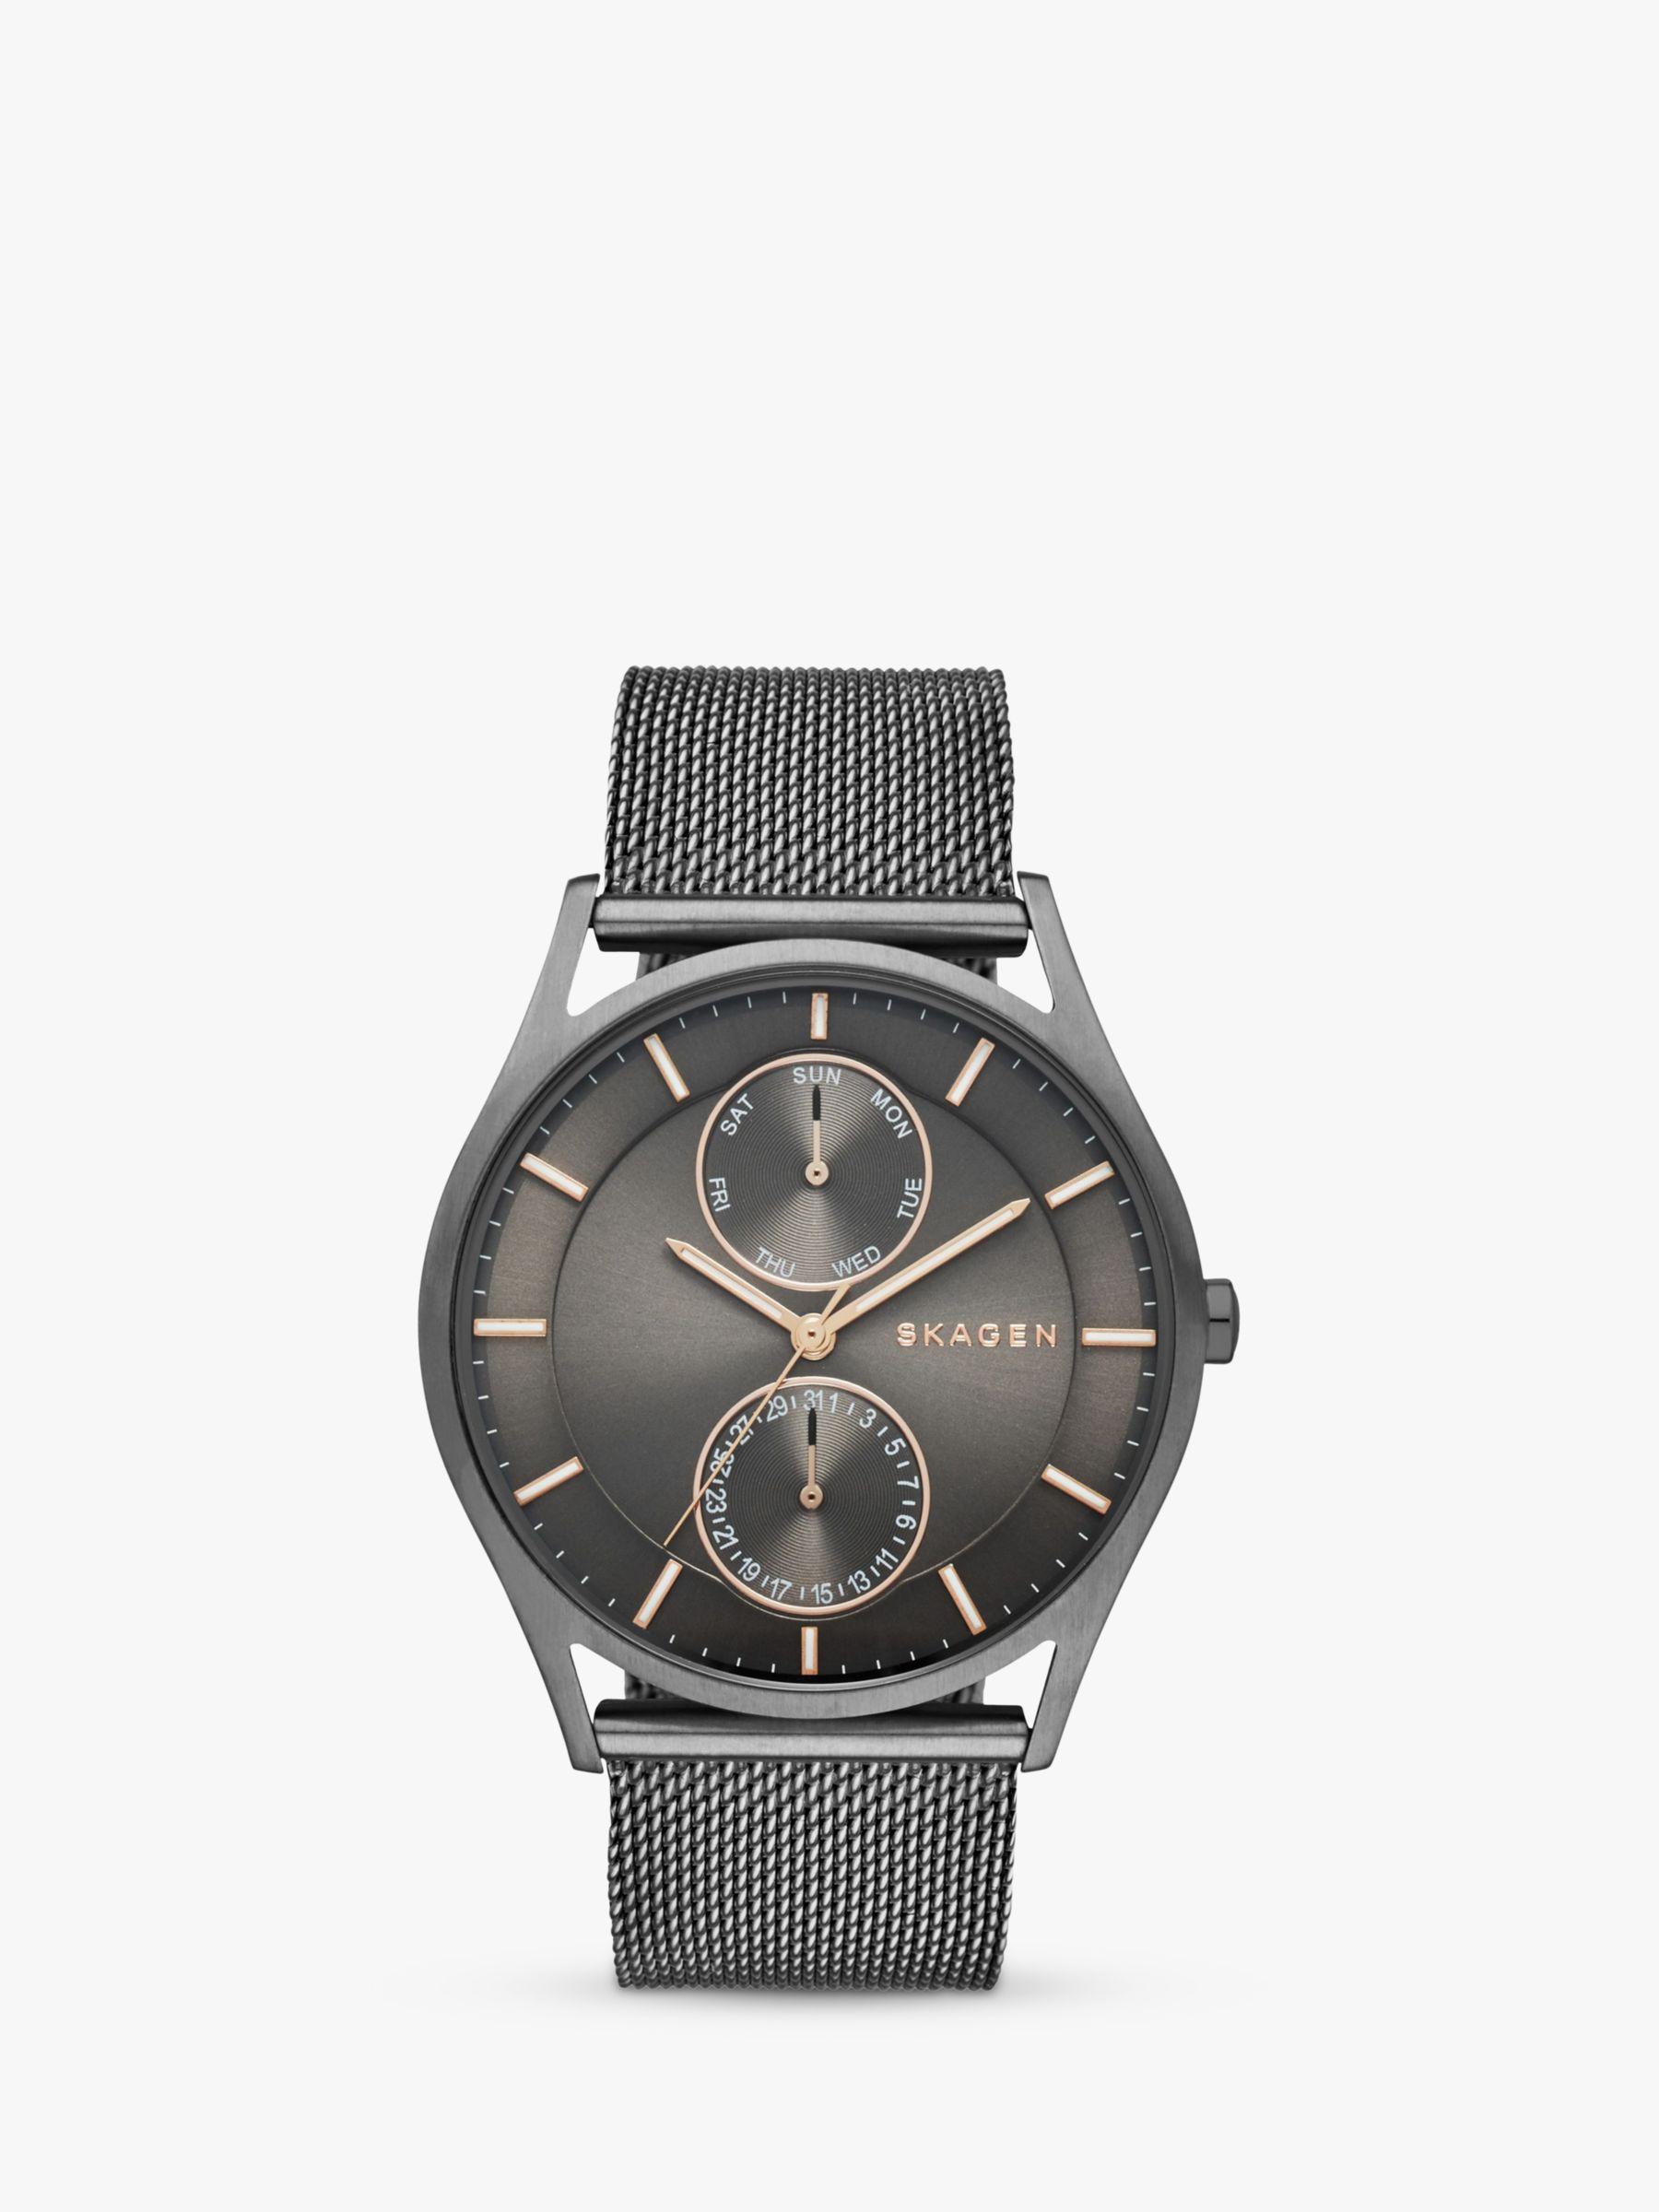 skagen Skagen SKW6180 Men's Holst Chronograph Stainless Steel Mesh Bracelet Strap Watch, Gunmetal/Black